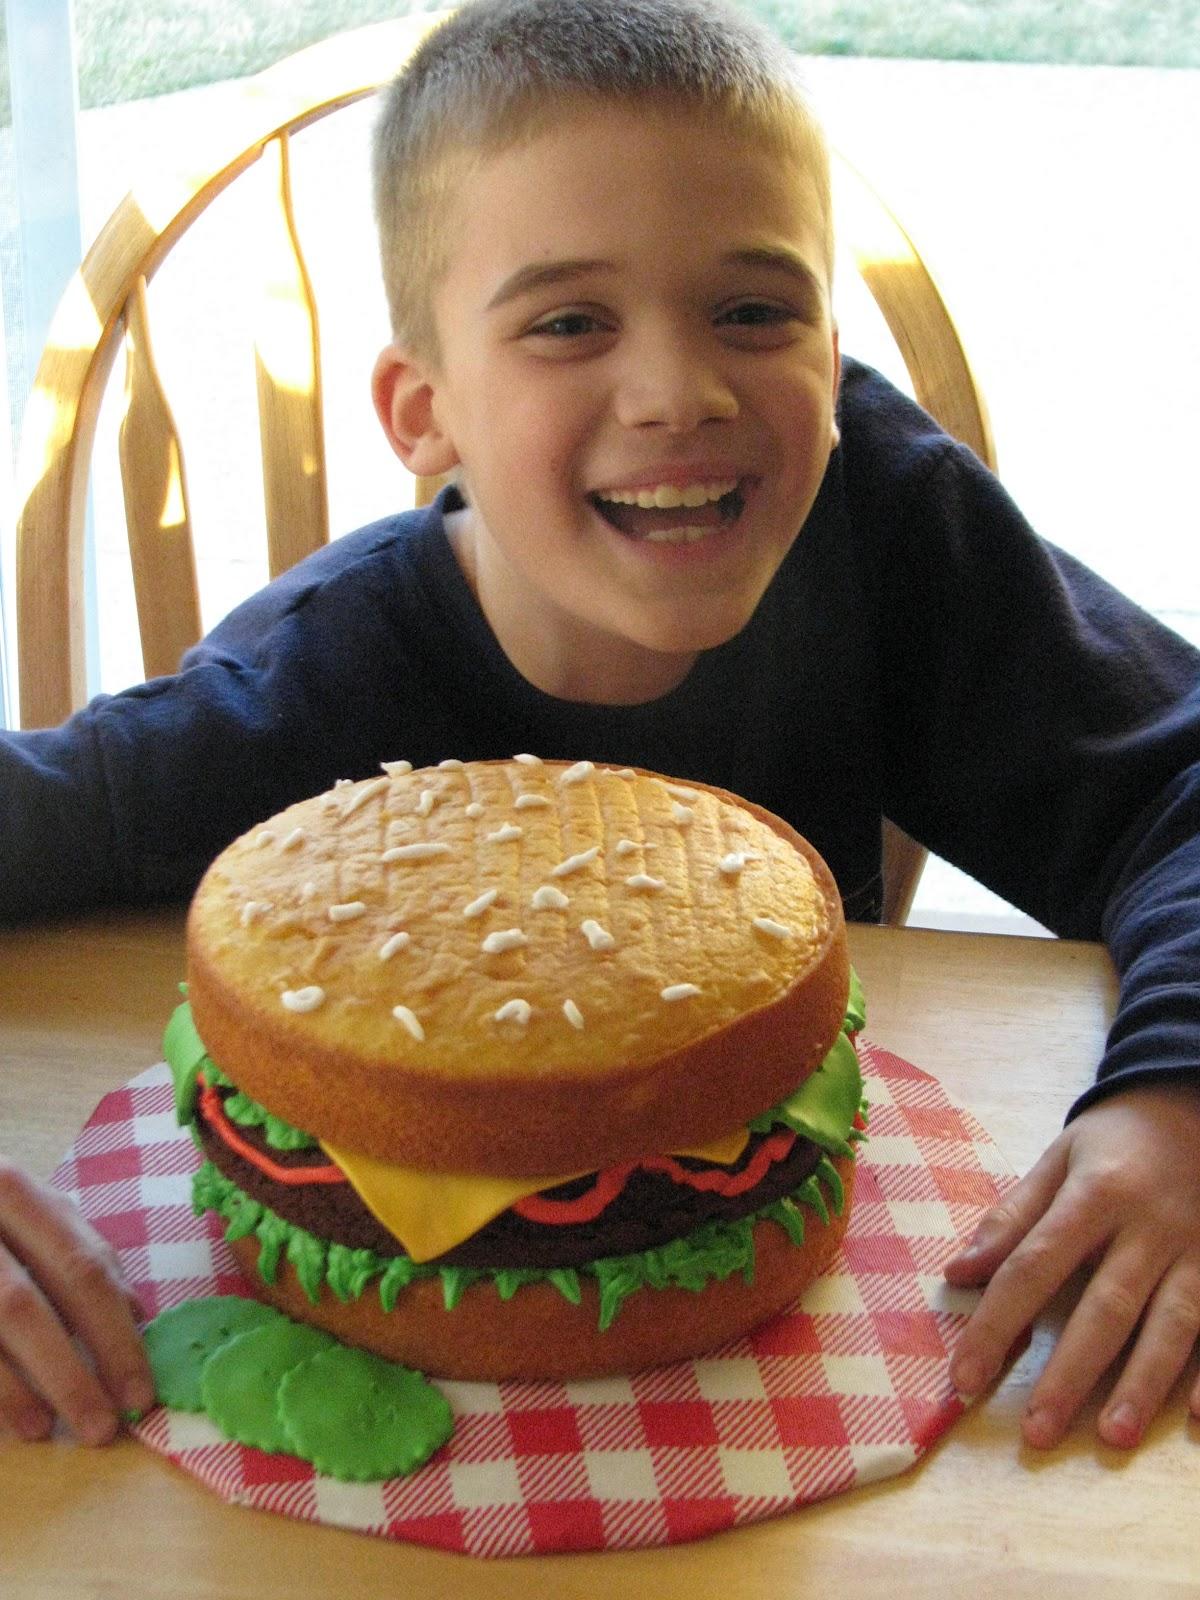 Birthday Cake That Looks Like A Hamburger